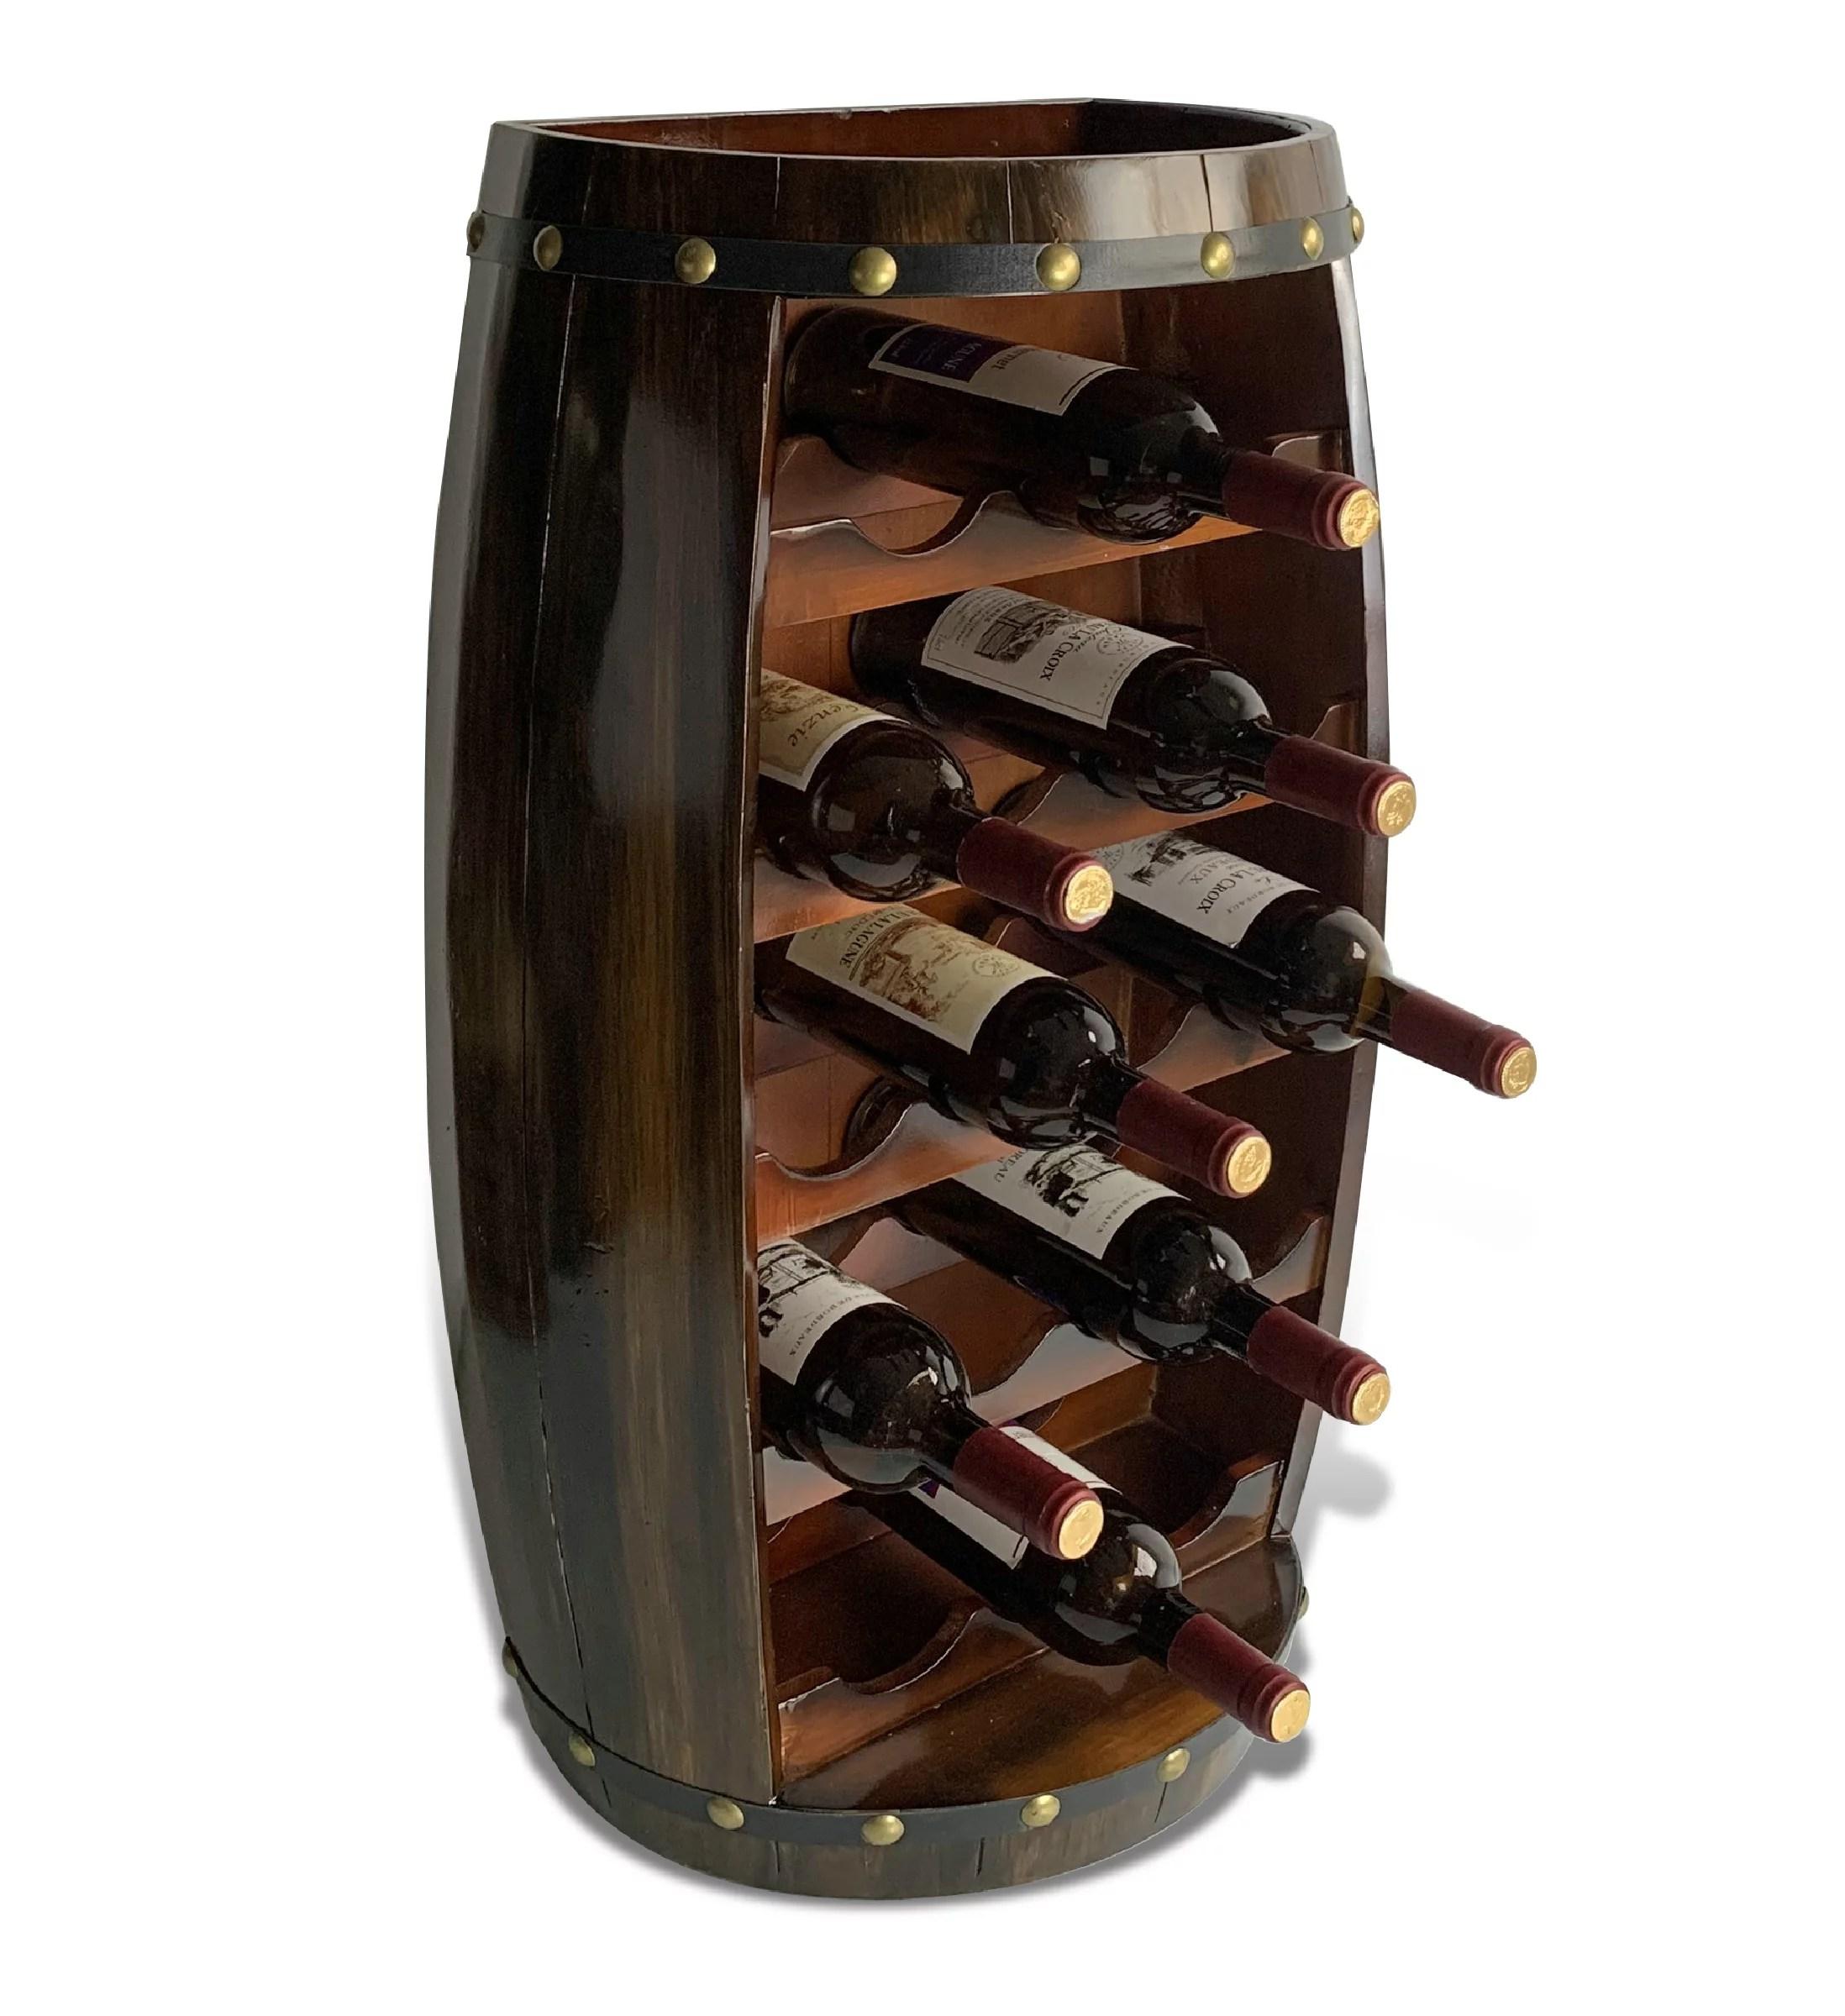 cota global alexander wall mounted wine rack 18 wine bottles freestanding wooden barrel wine holder hanging bottle rack or floor stand rustic wine